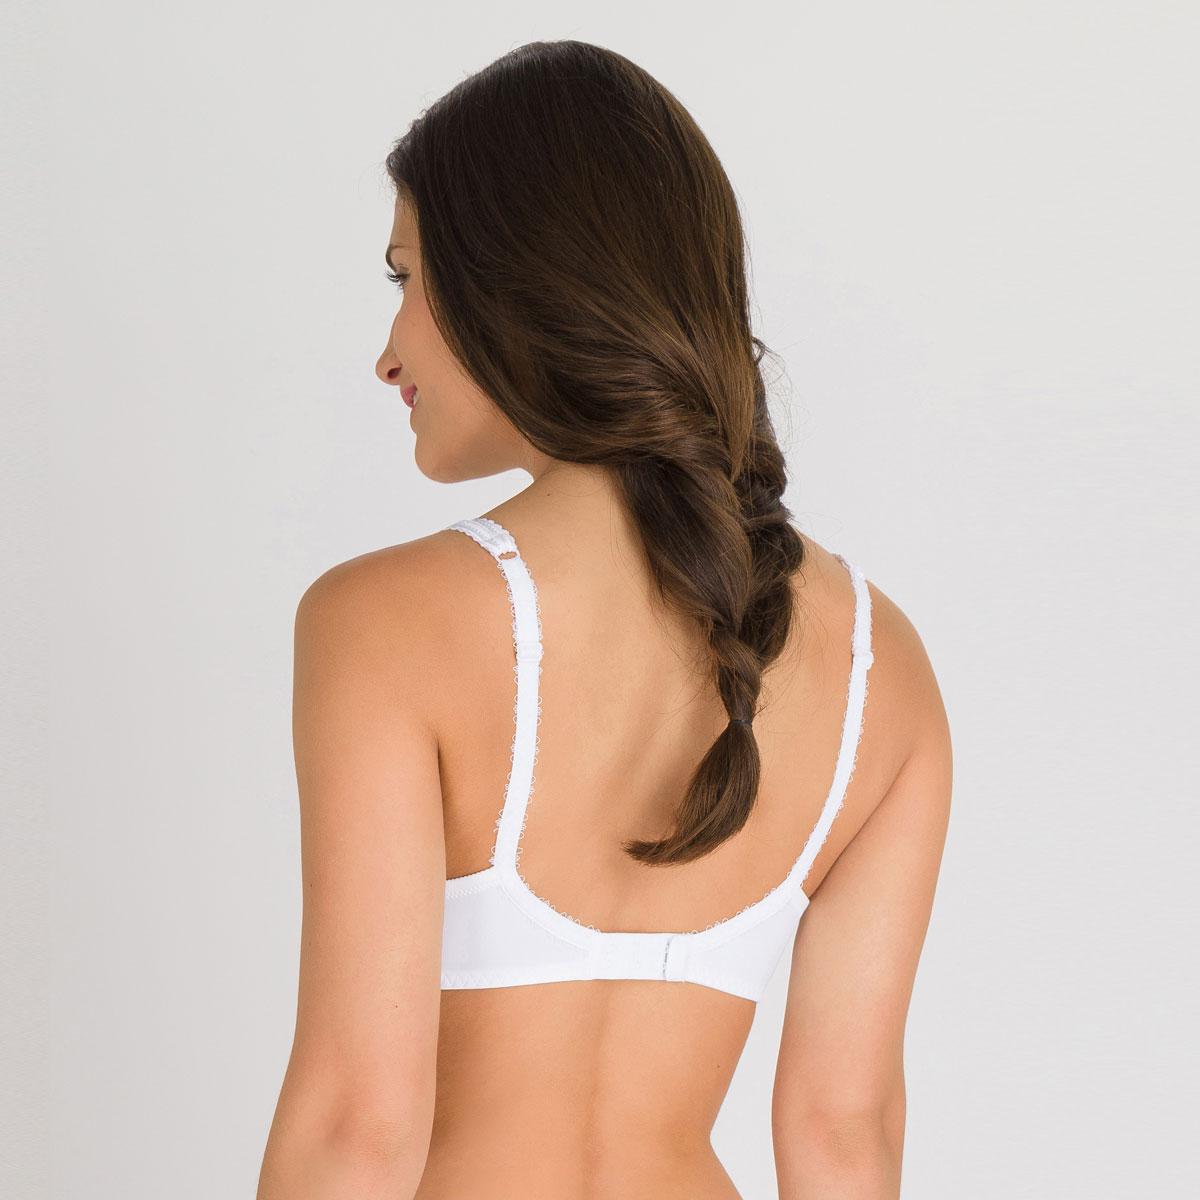 Soutien-gorge spacer sans armatures blanc  - Flower Elegance-PLAYTEX